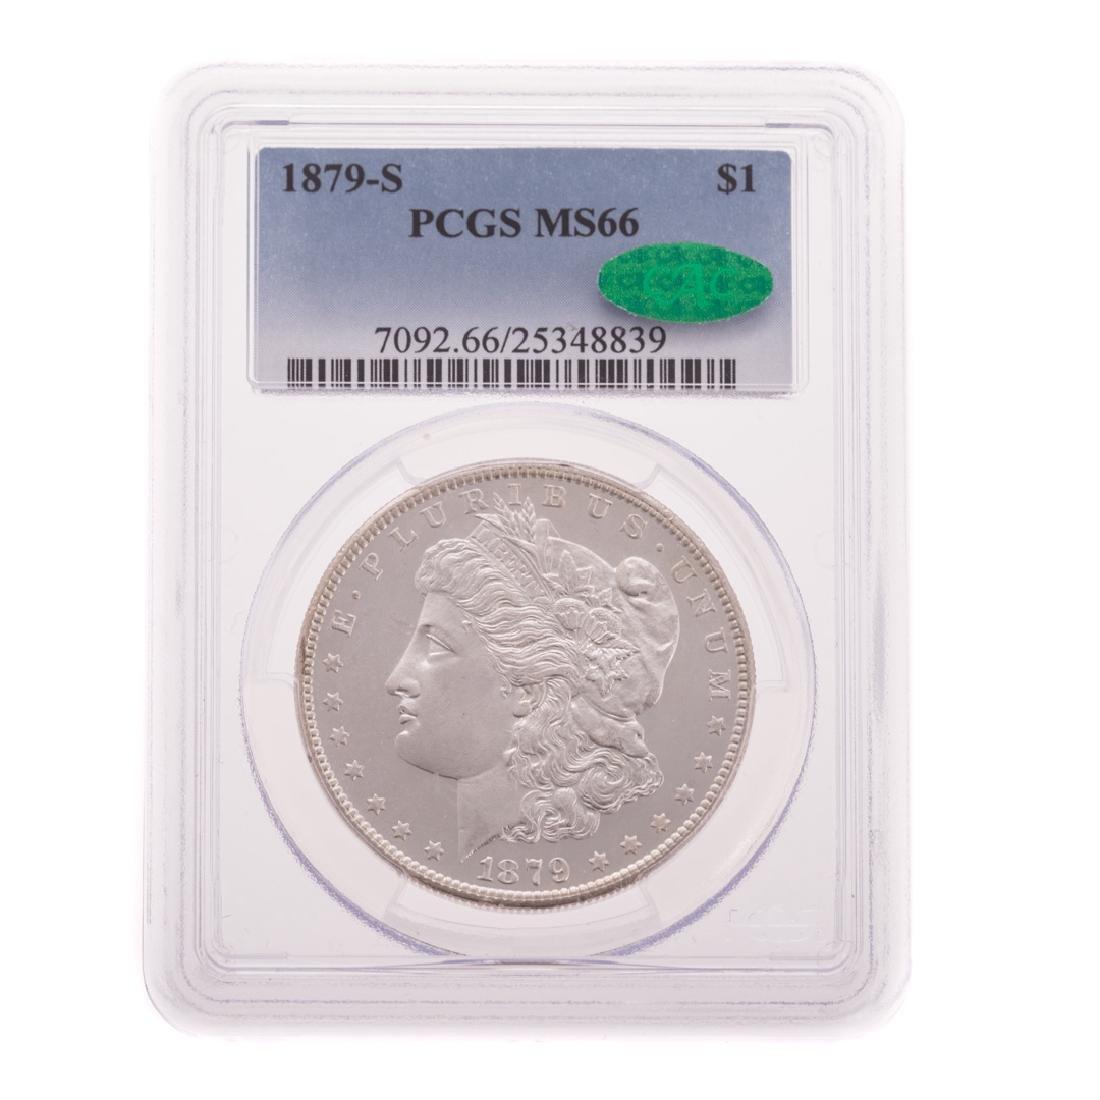 [US] 1879-S PCGS MS66 CAC Morgan Dollar